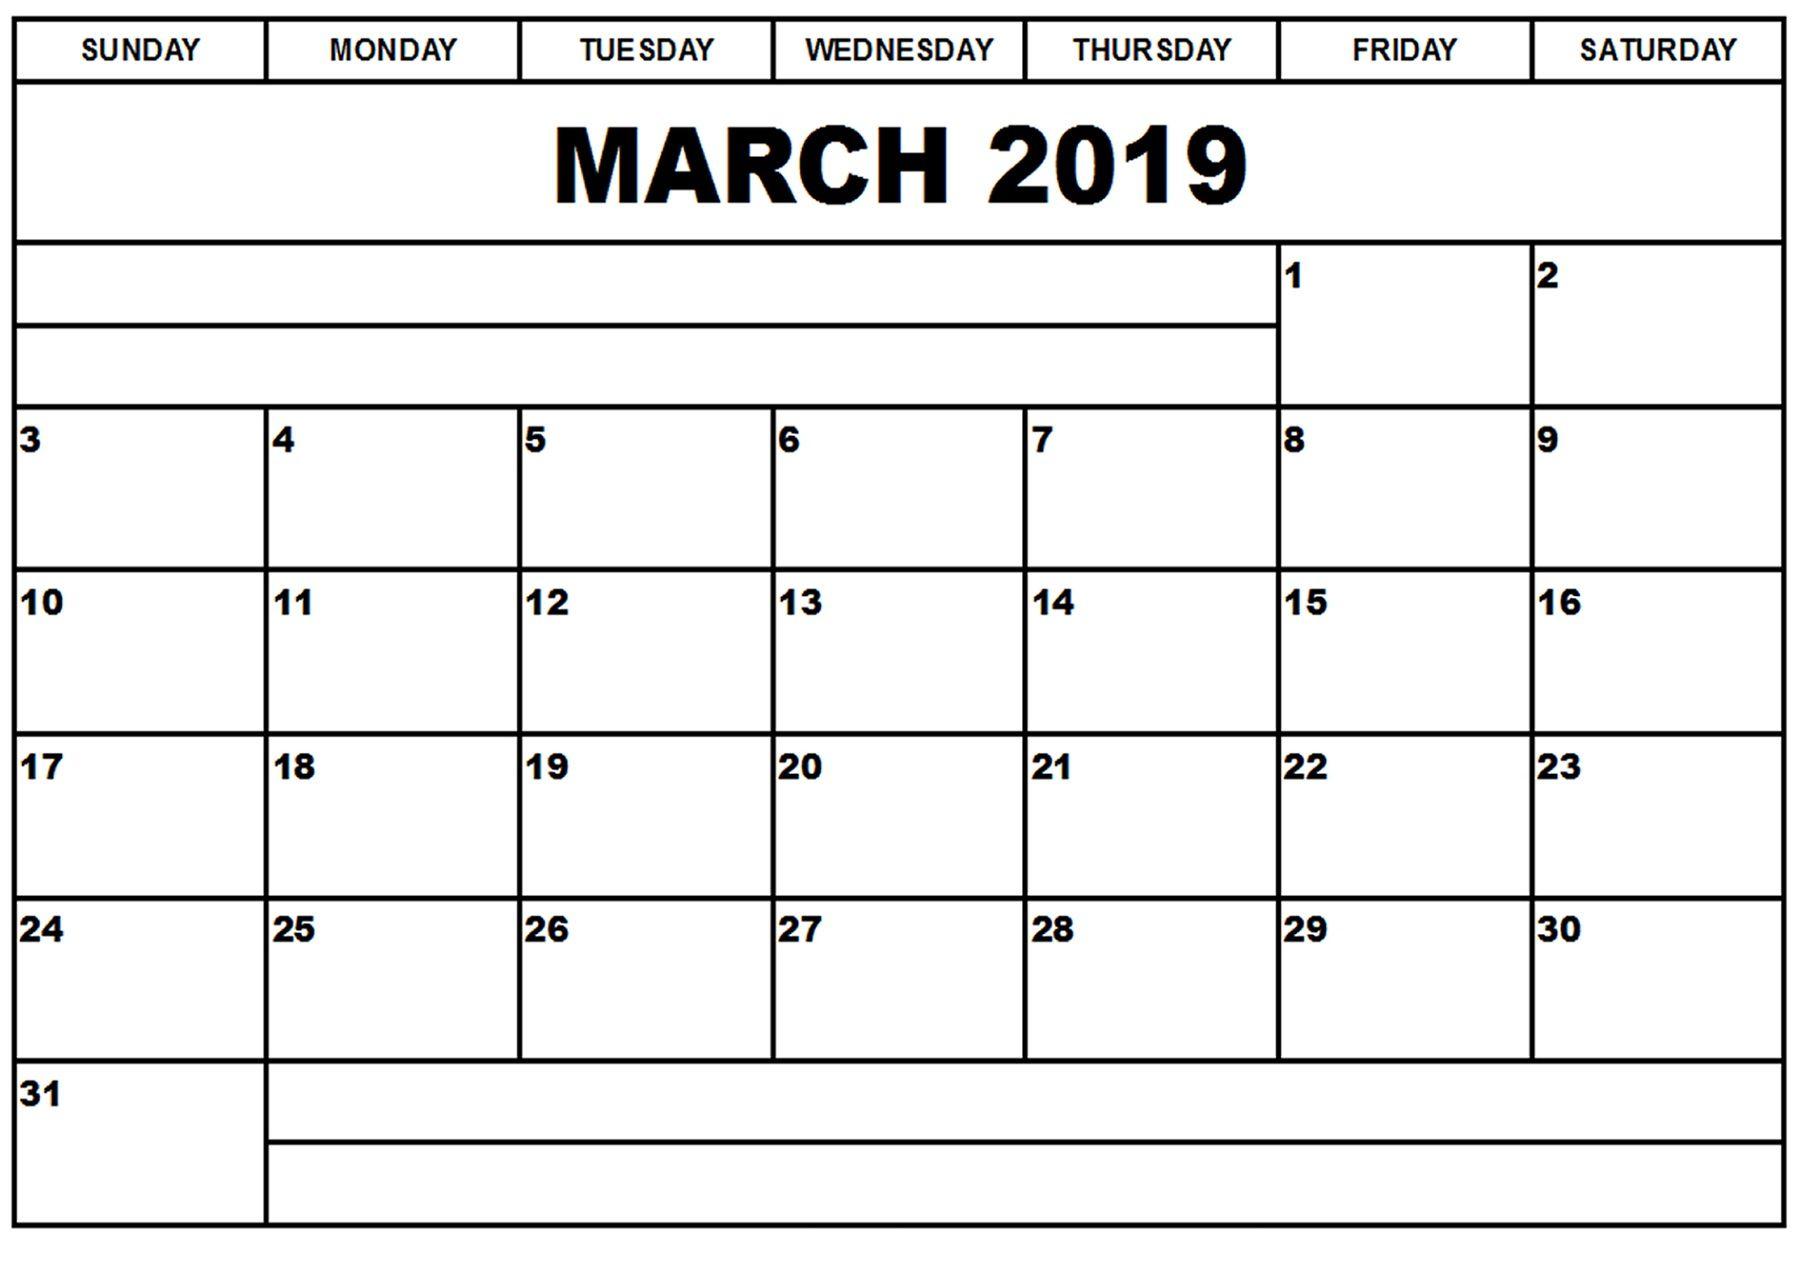 Blank Printable Calendar March 2019 | Printableshelter | Calendar throughout Blank Printable Calendar March